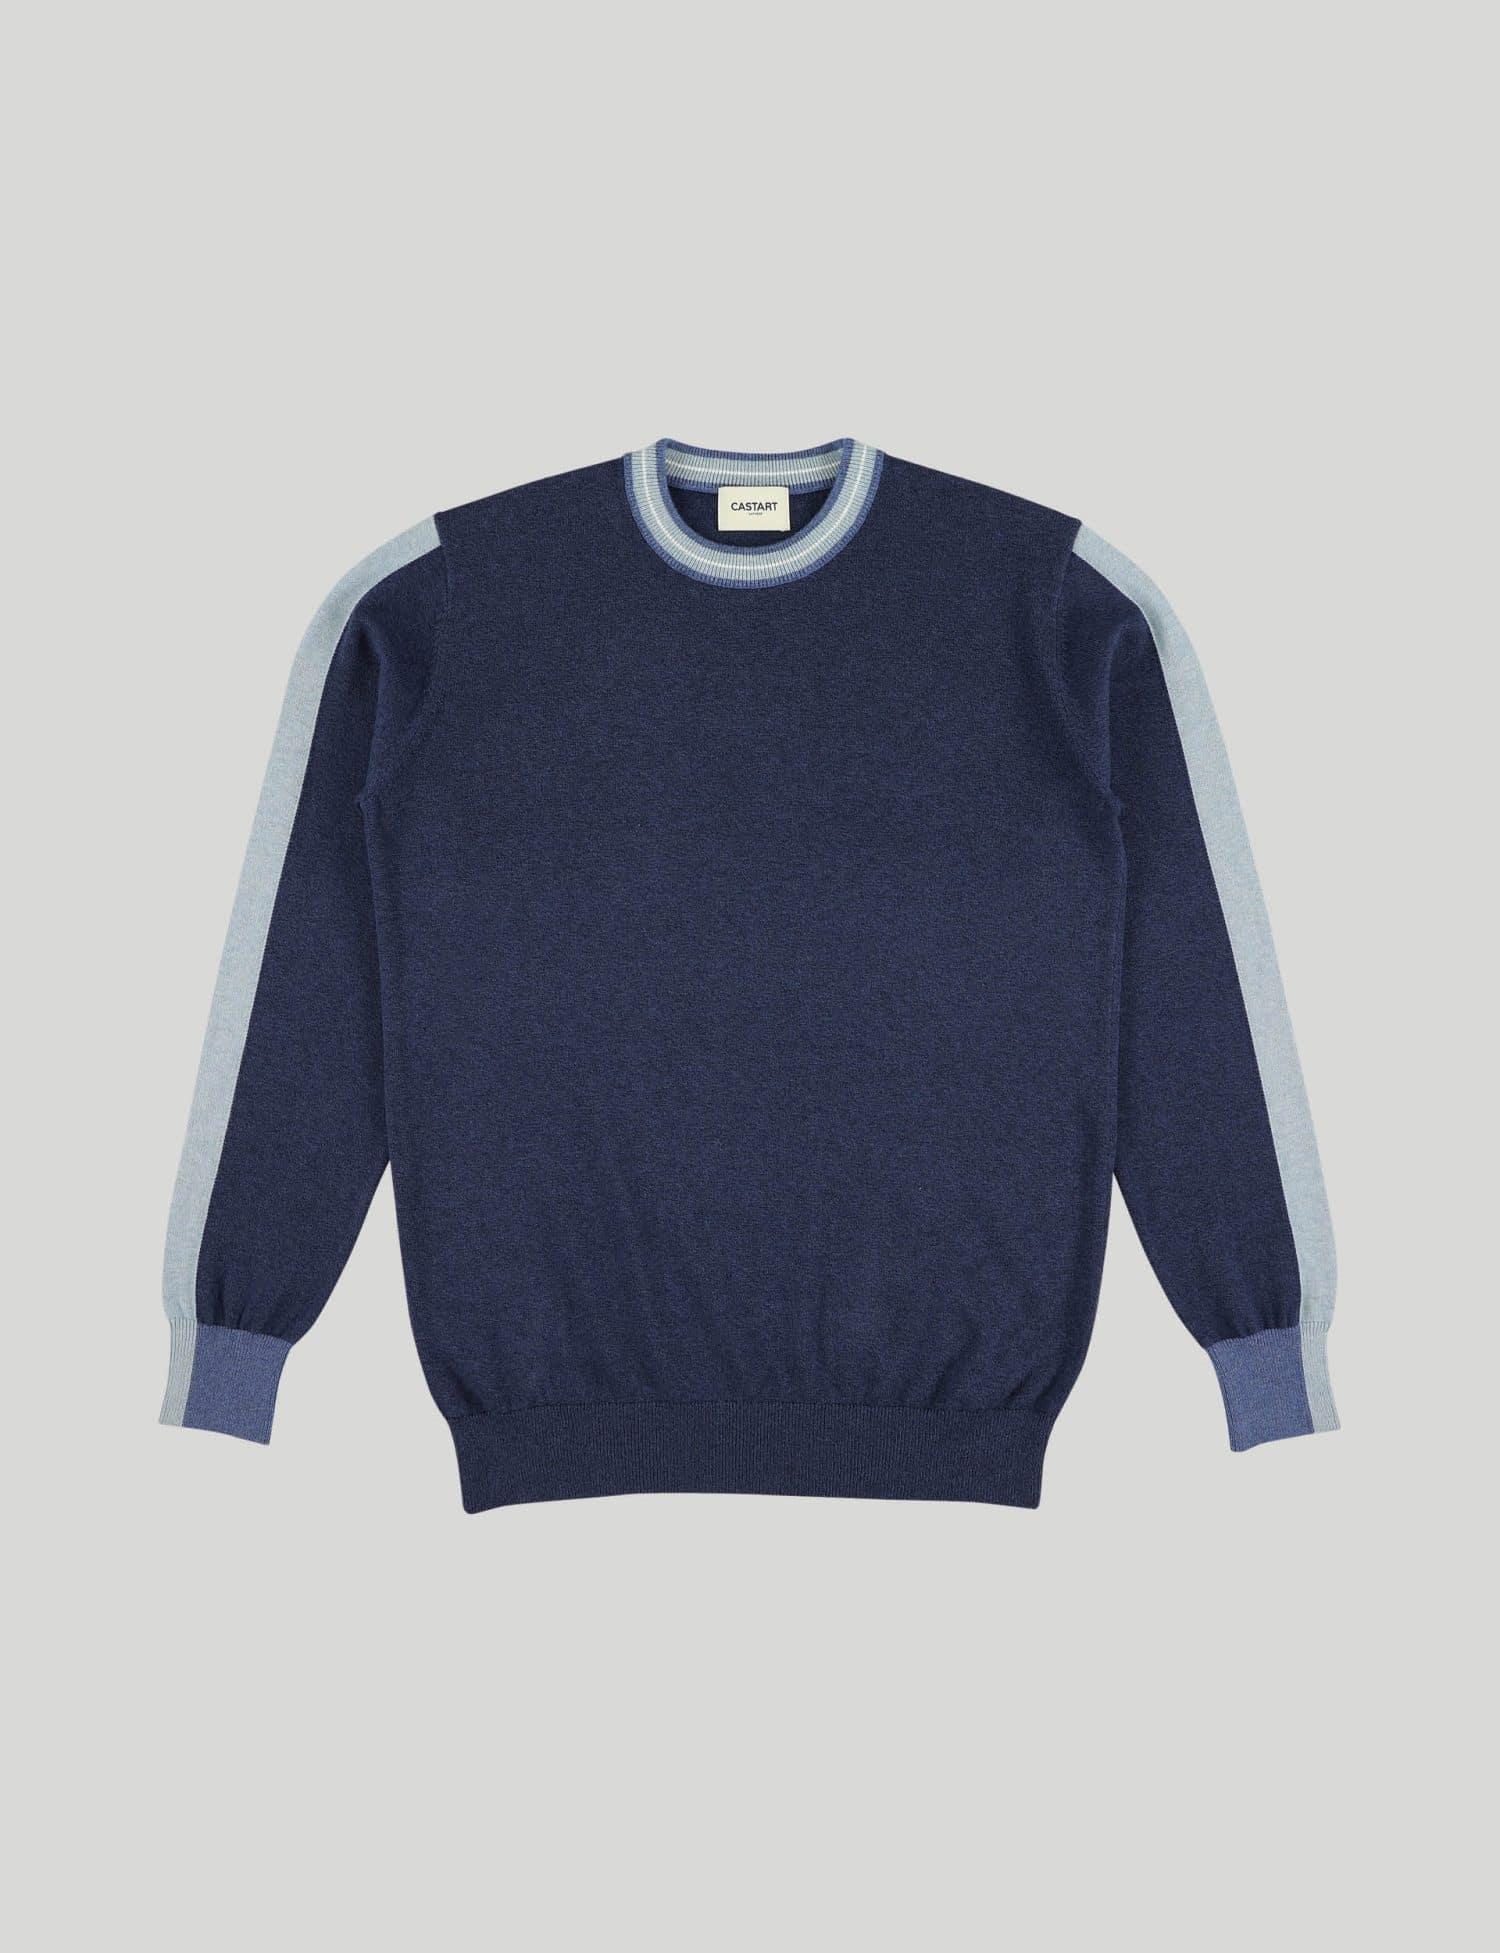 Castart - Sunbuddy knitwear - Navy Blue